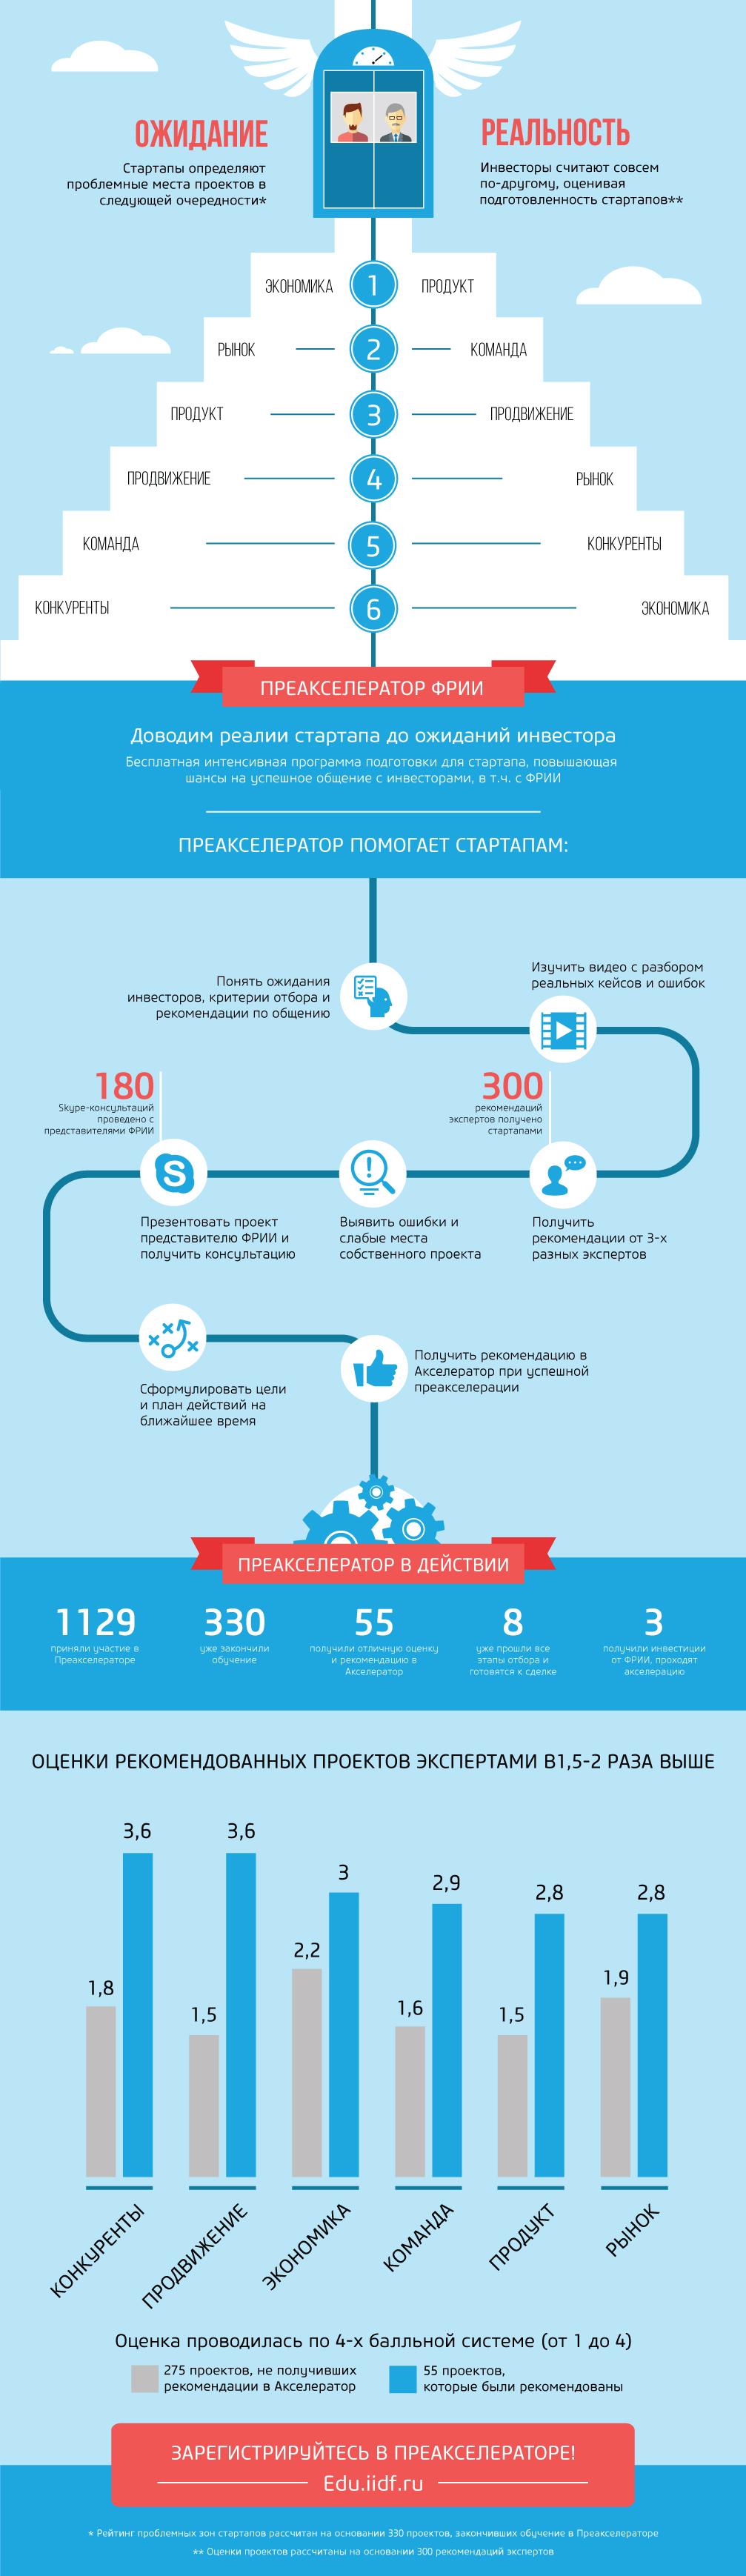 preaccelerator_infographics_iidf_19_05.j